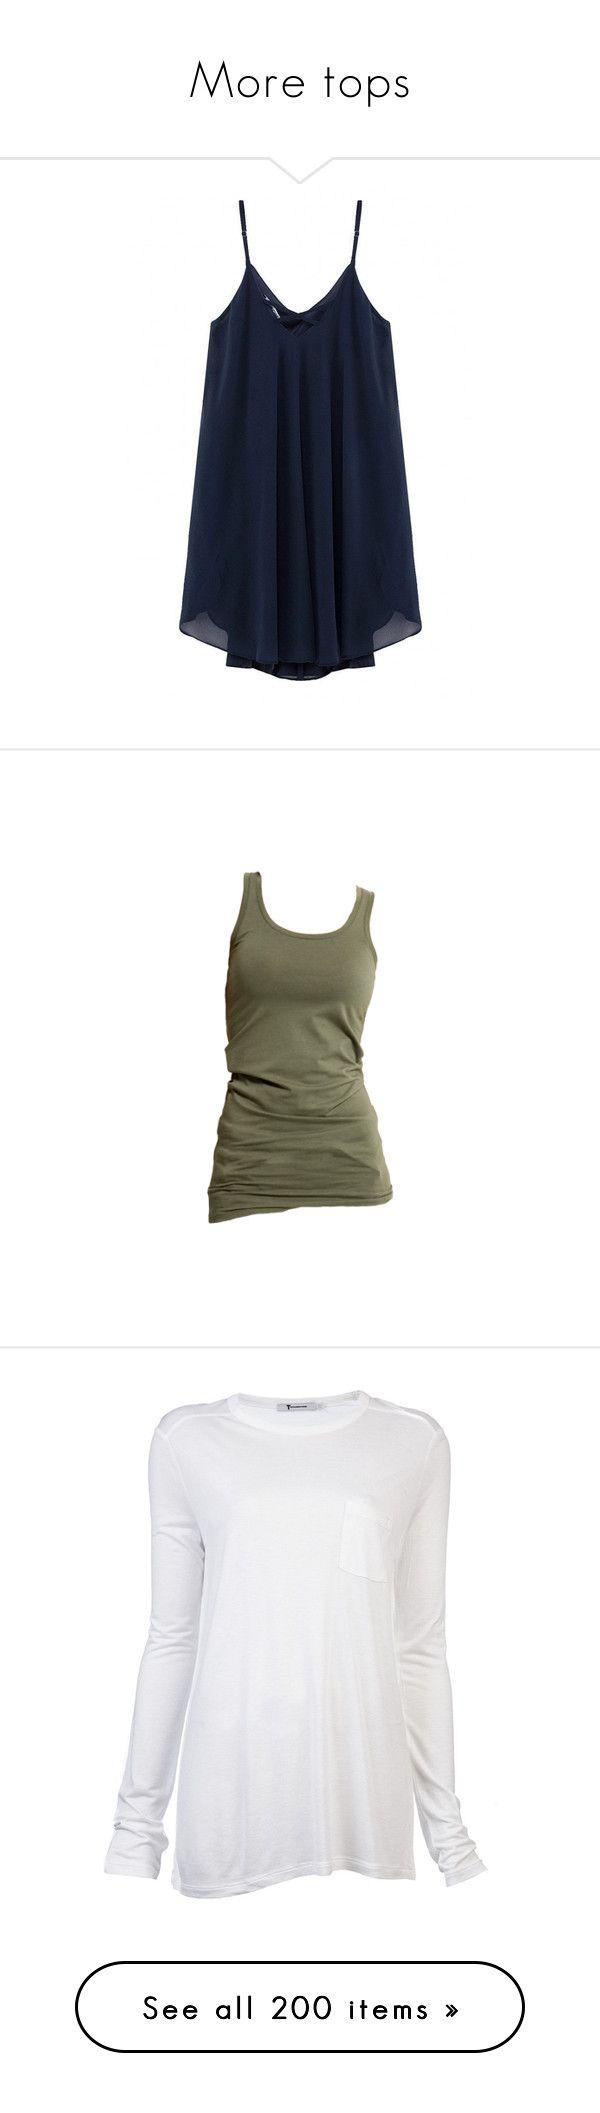 """More tops"" by purpledaisy47 ❤ liked on Polyvore featuring dresses, tops, yoins, shirts, navy, chiffon cami, navy blue cami, navy camisole, blue cami and blue chiffon dress"